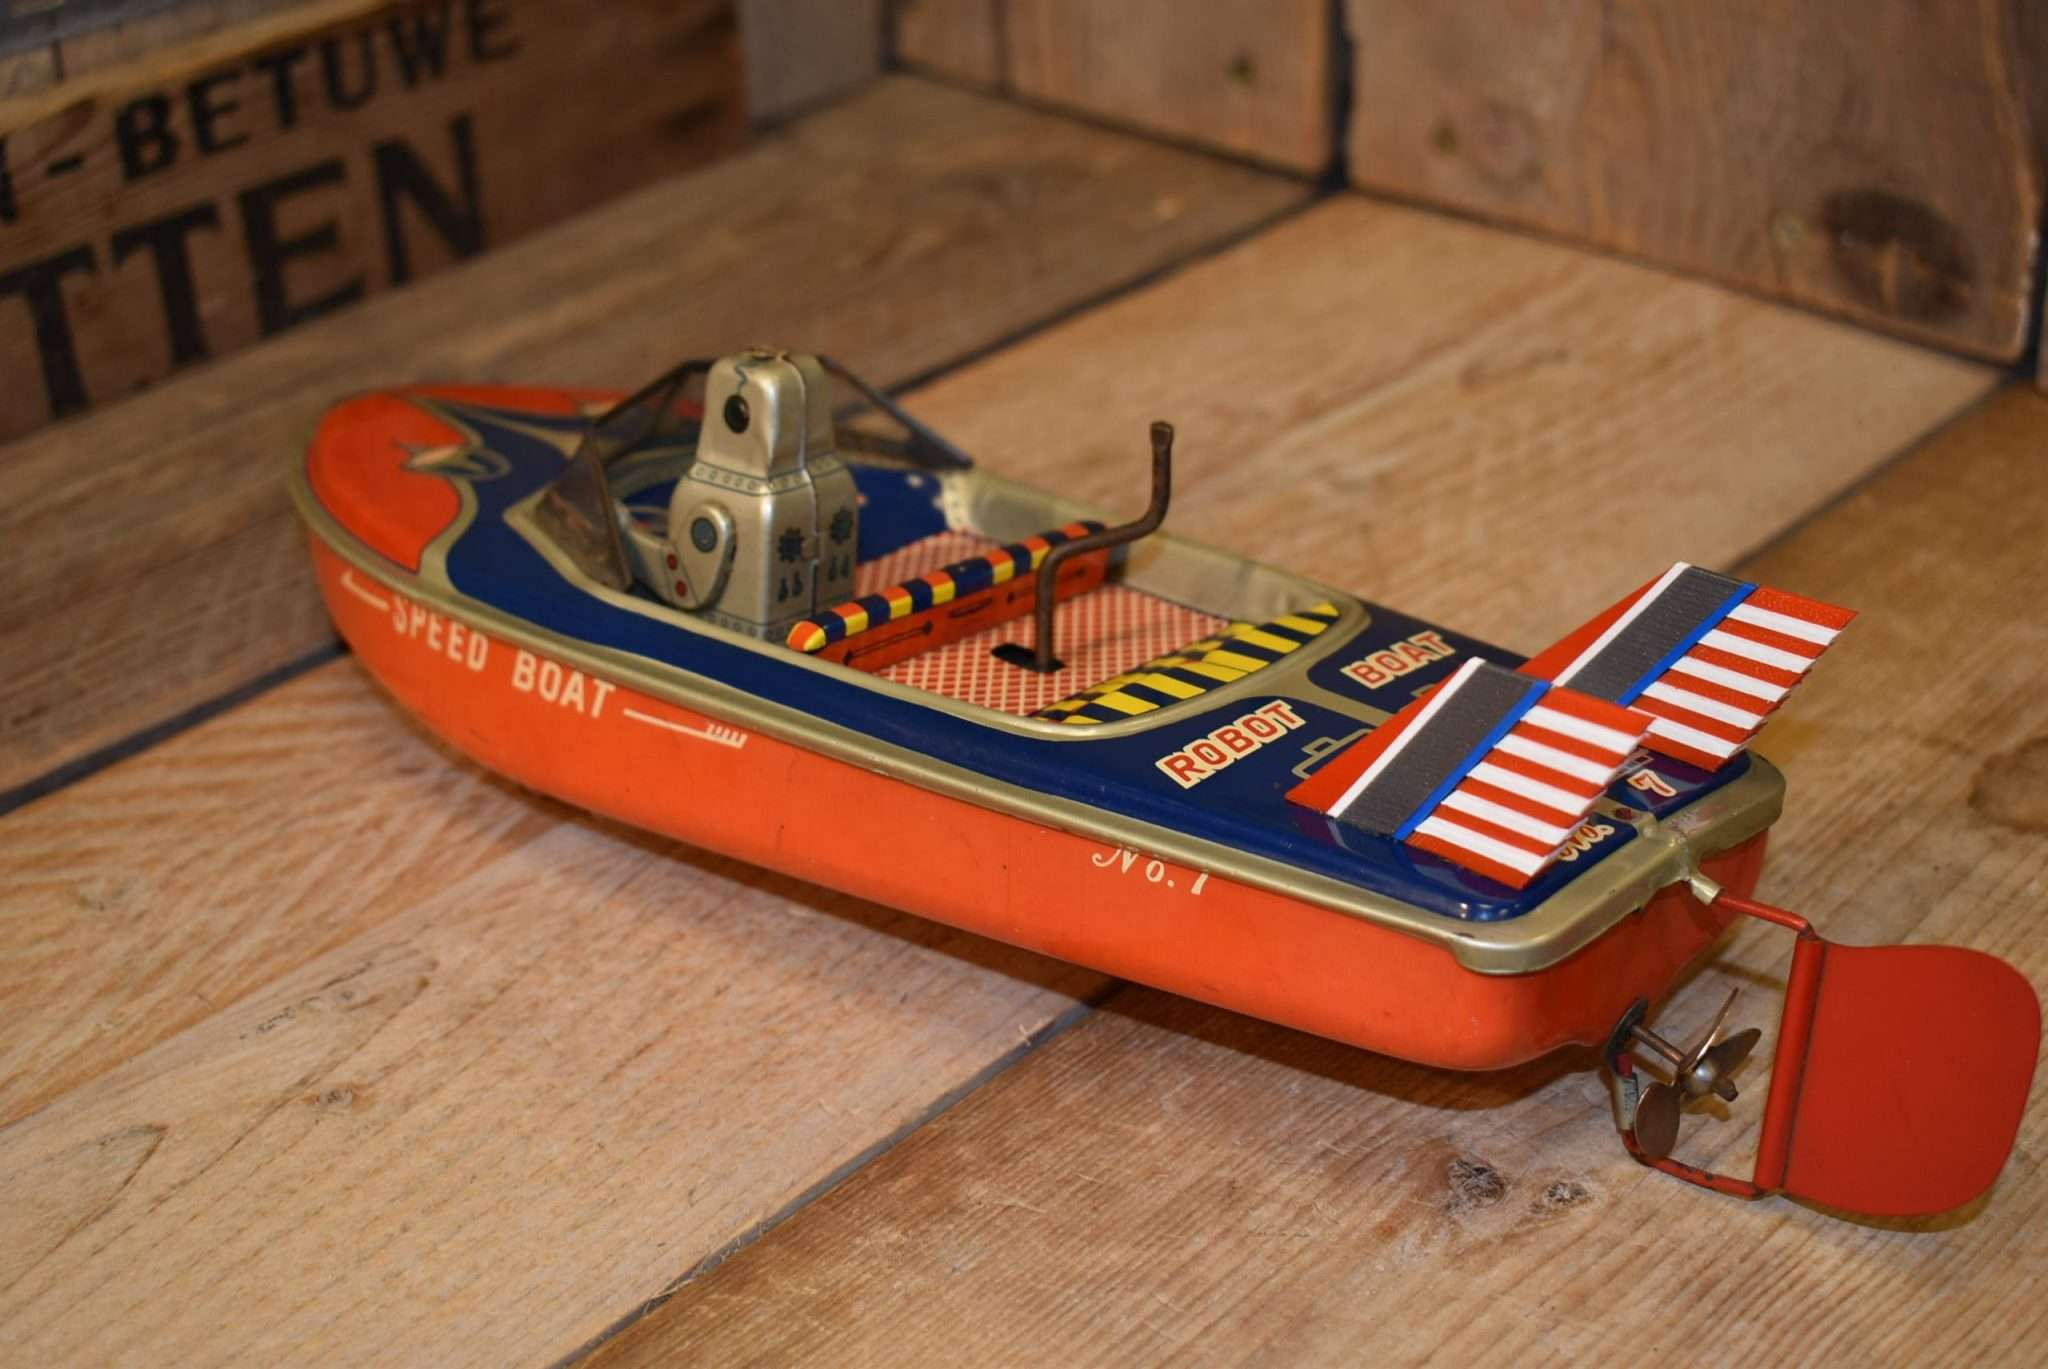 Marusan - Robot Speed Boat No.7